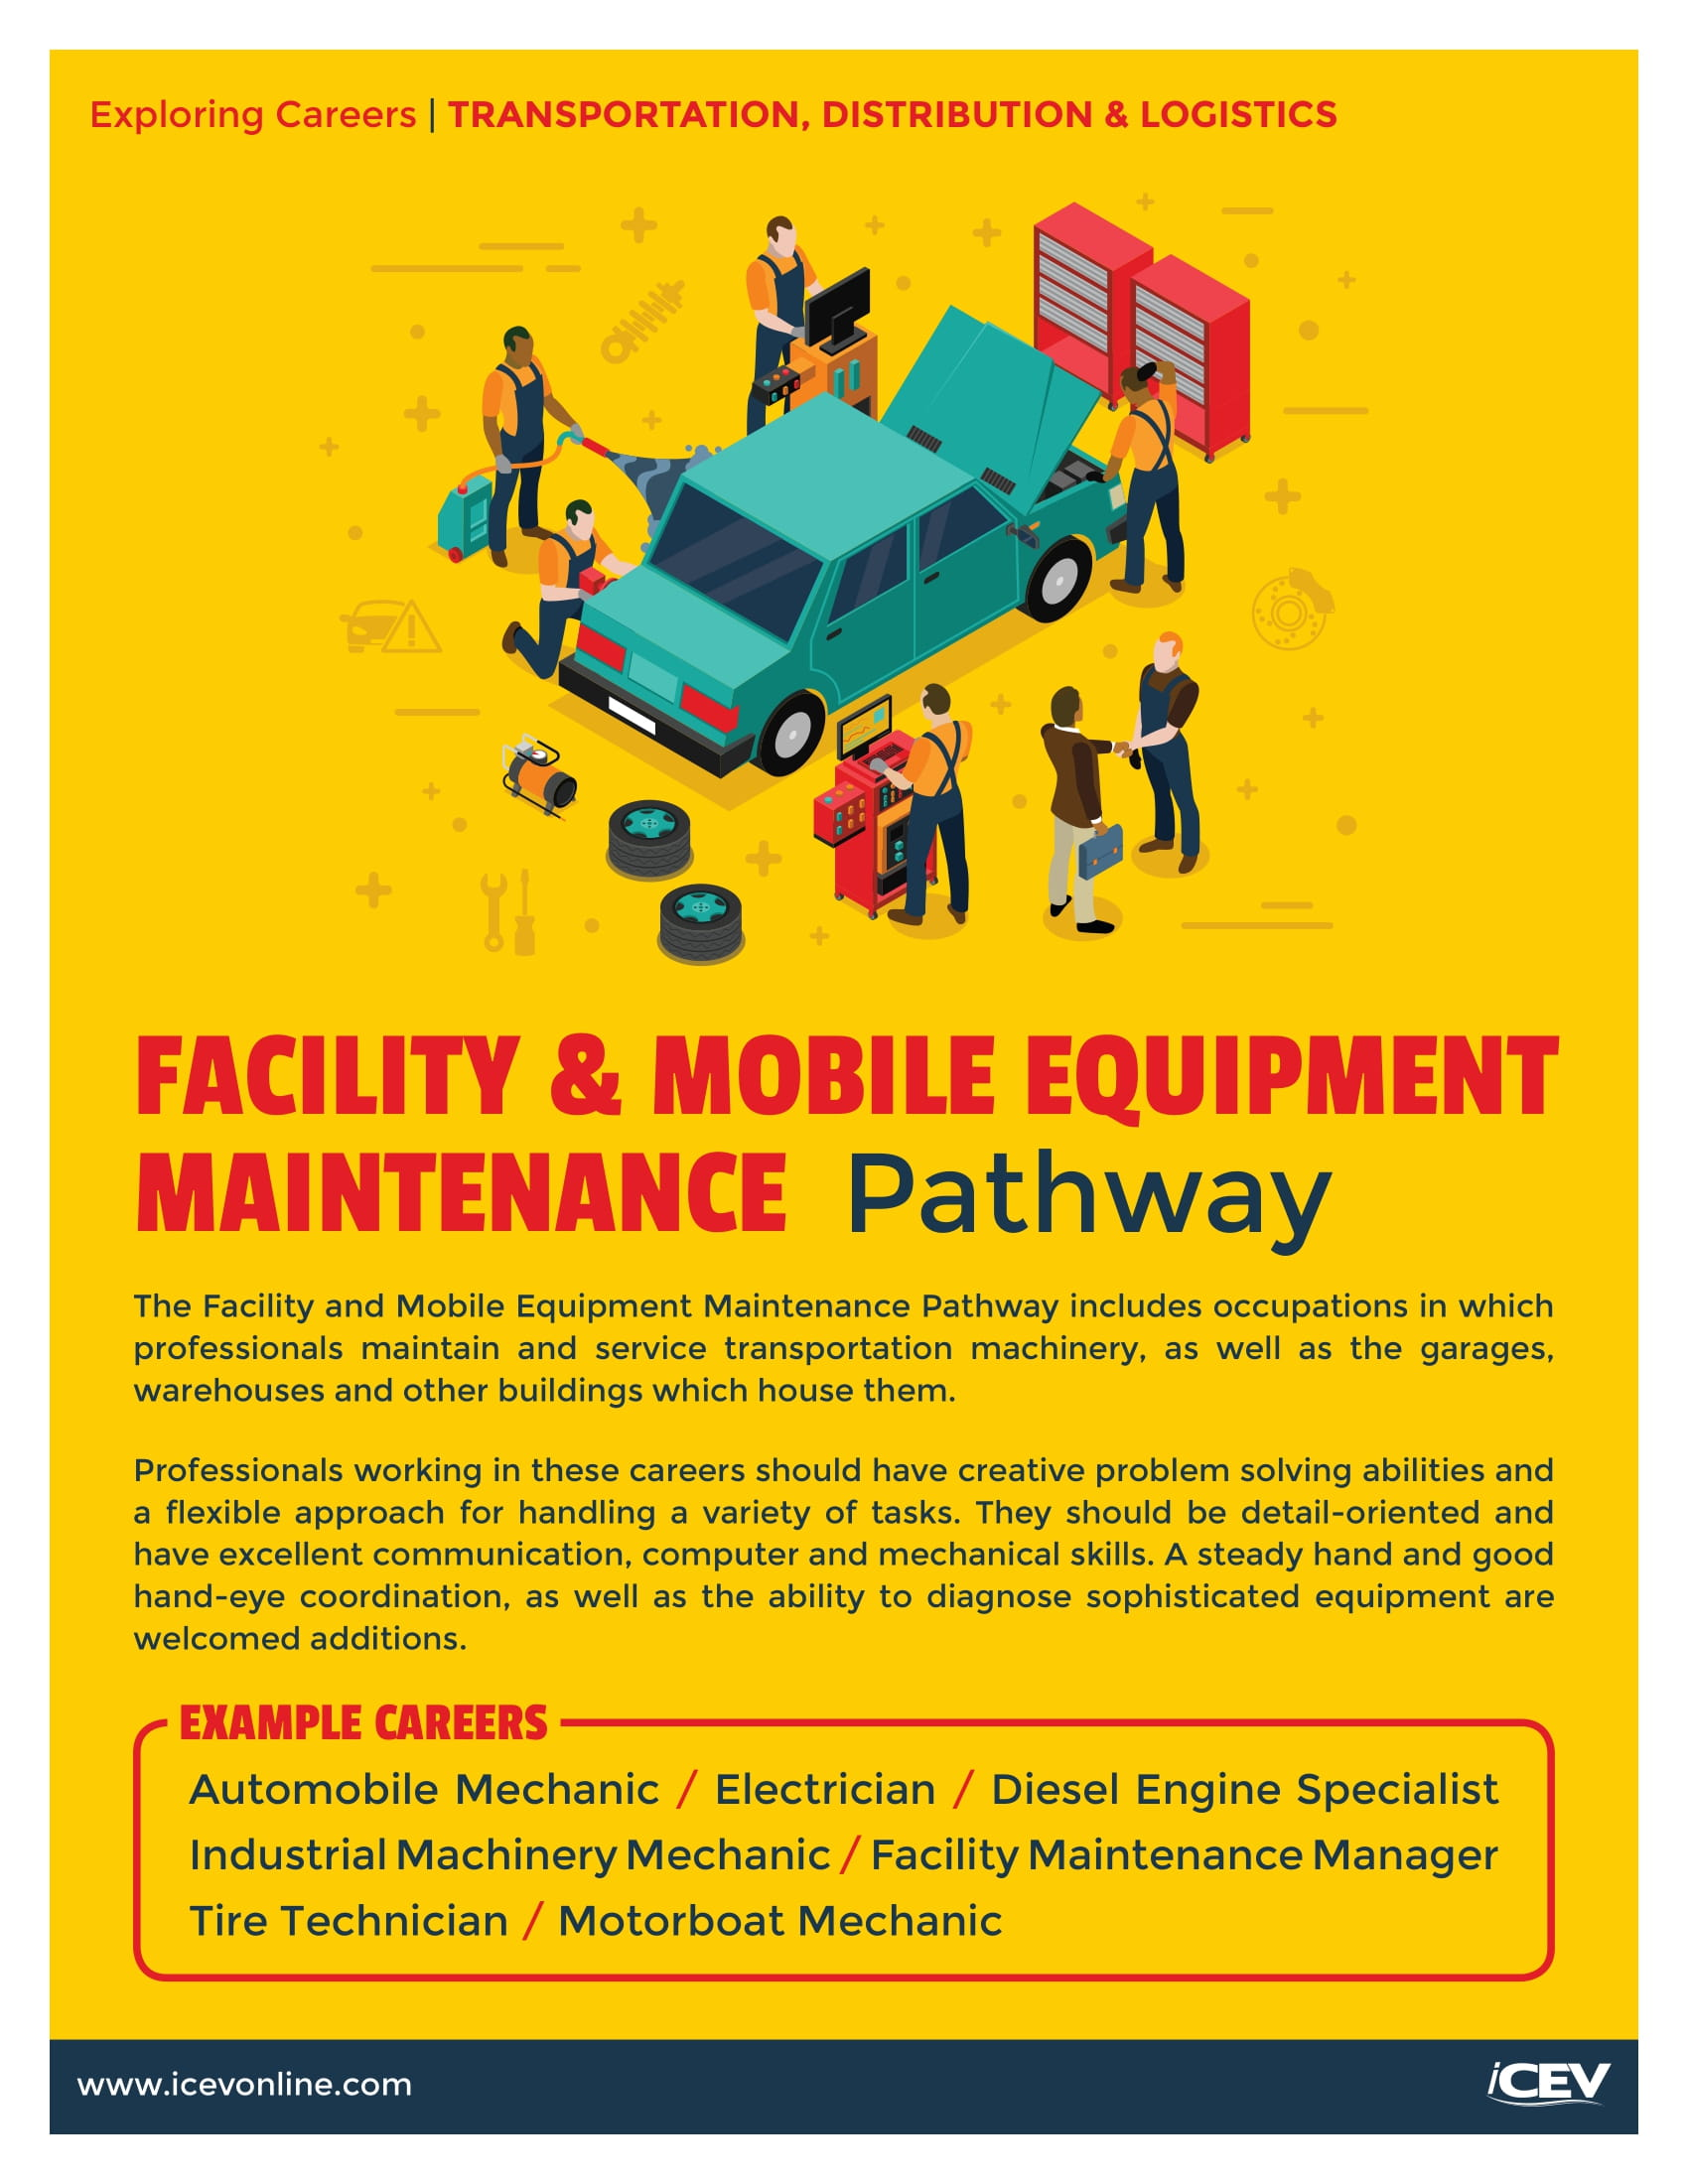 Transportation, Distribution & Logistics